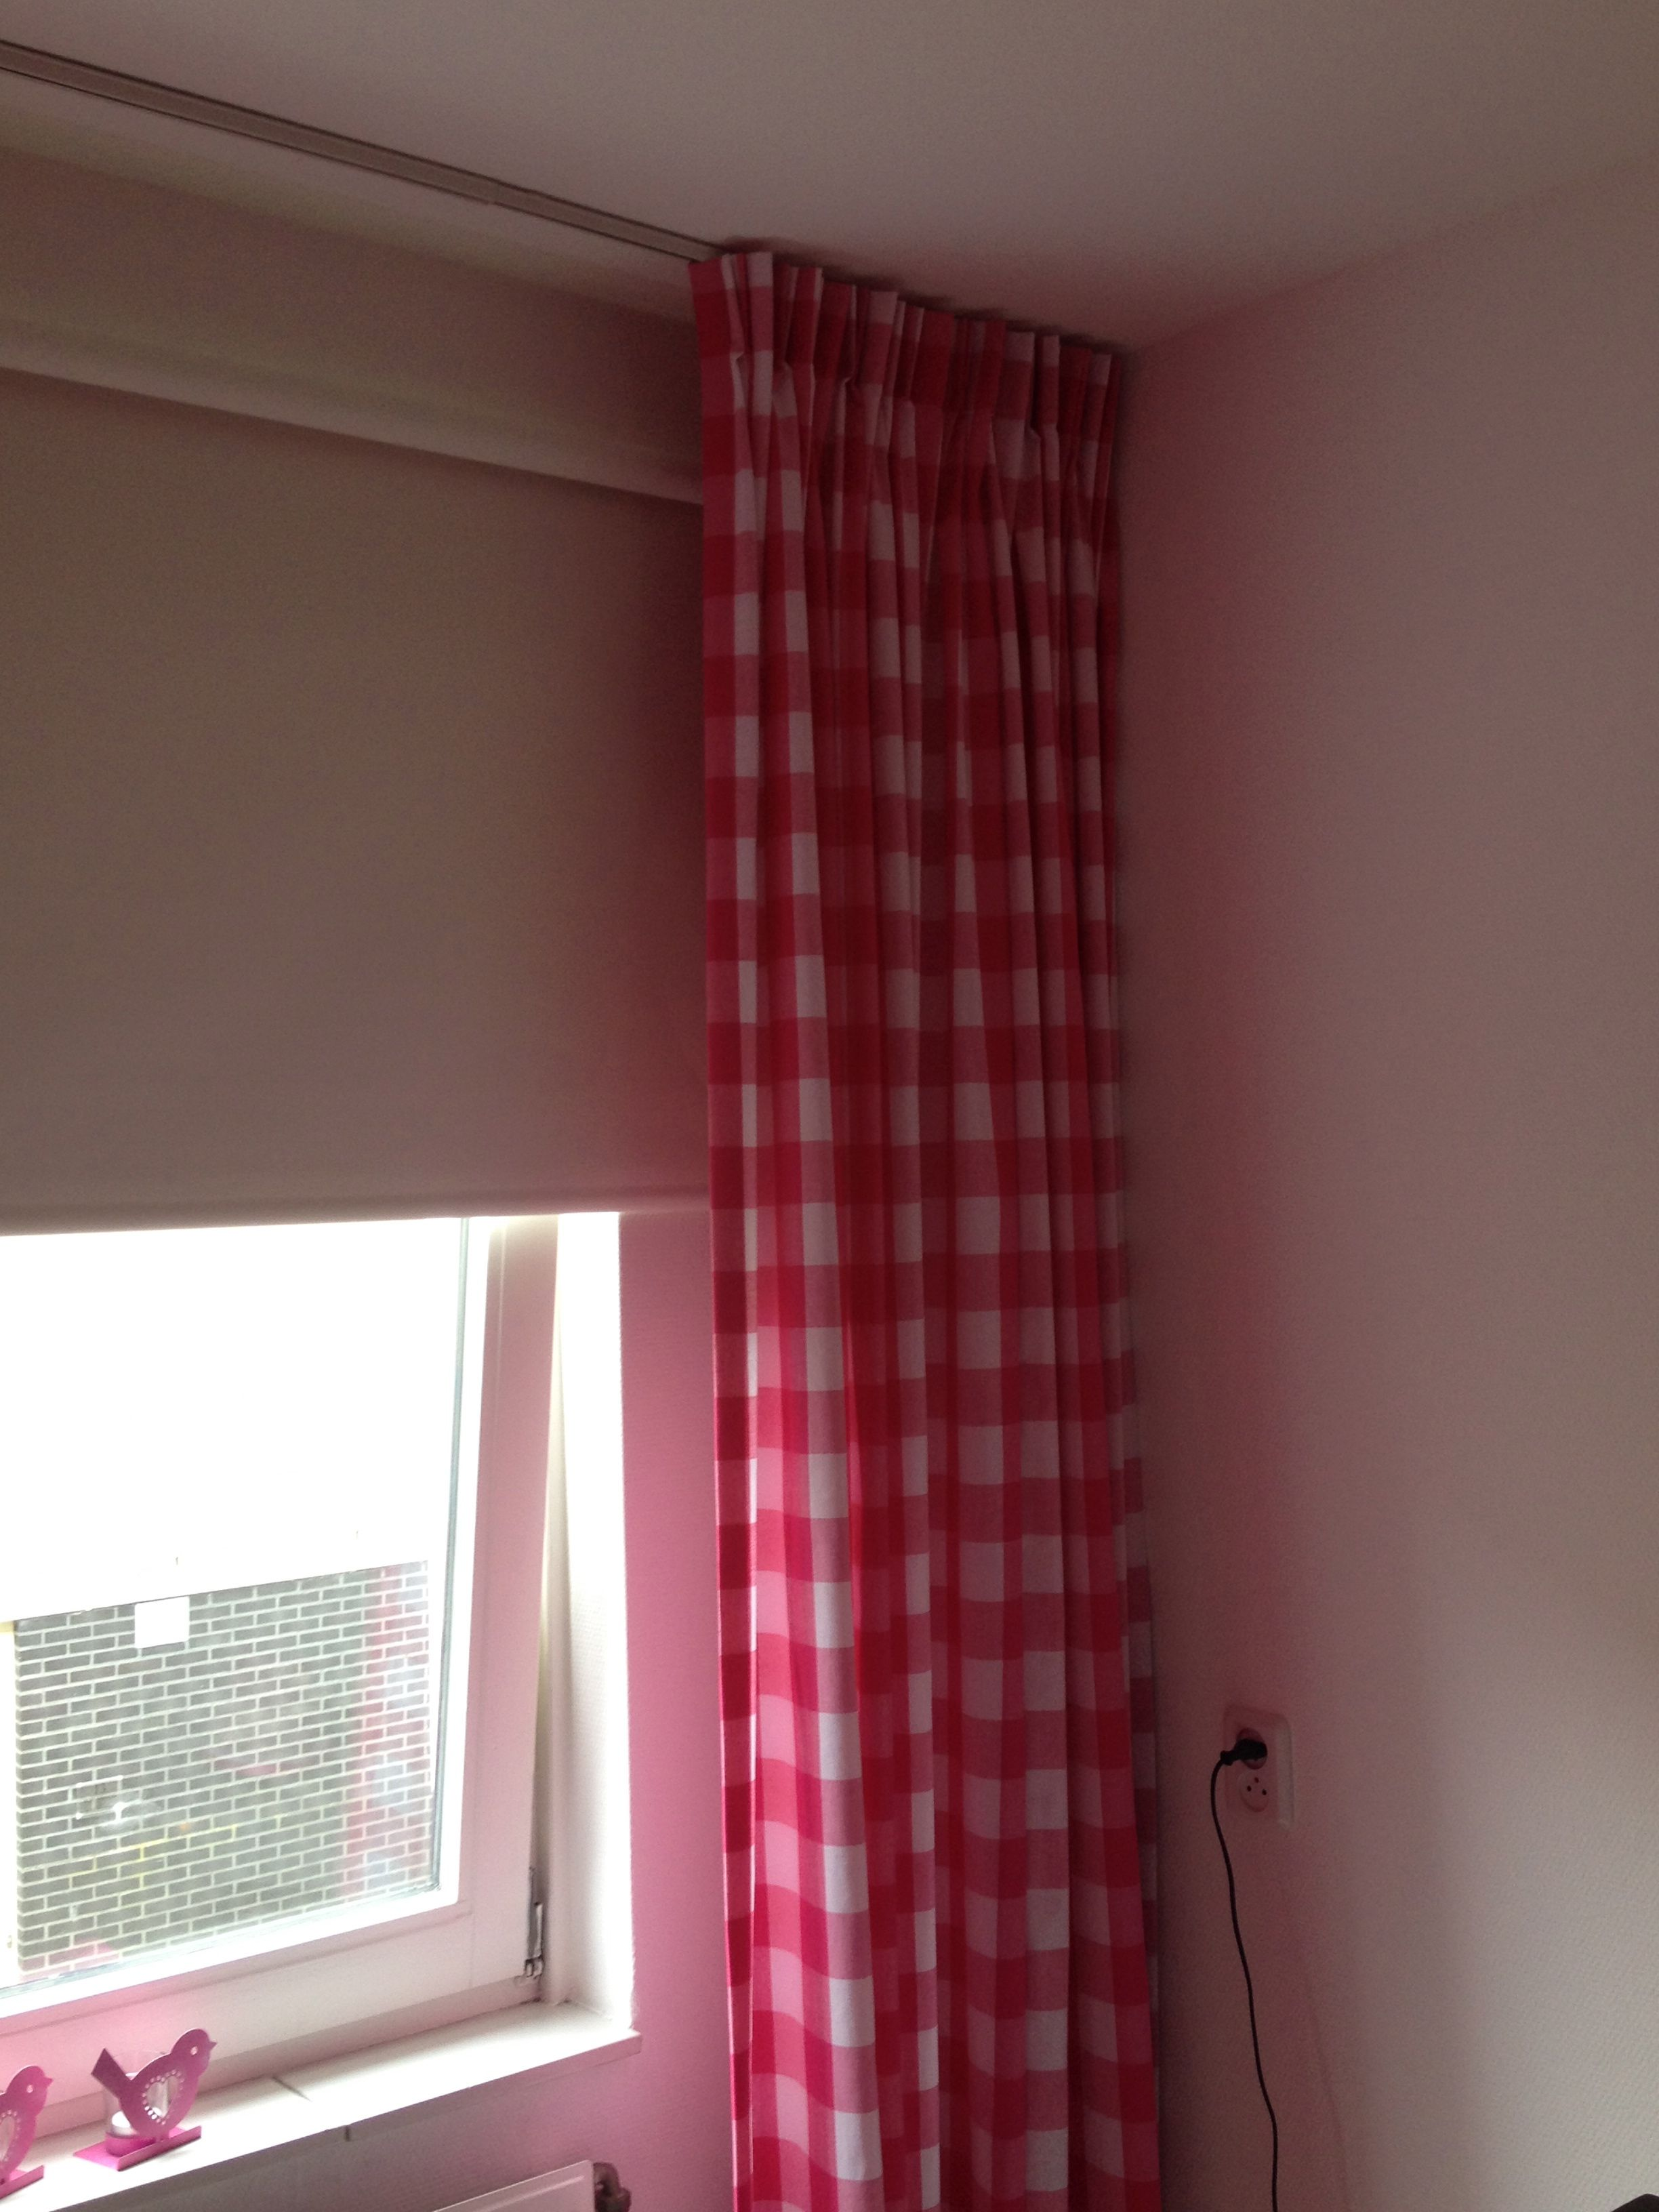 gordijn van boerenbont ruit stof 5cm op meisjeskamer in de kleur fuchsia roze stofkwaliteit 875